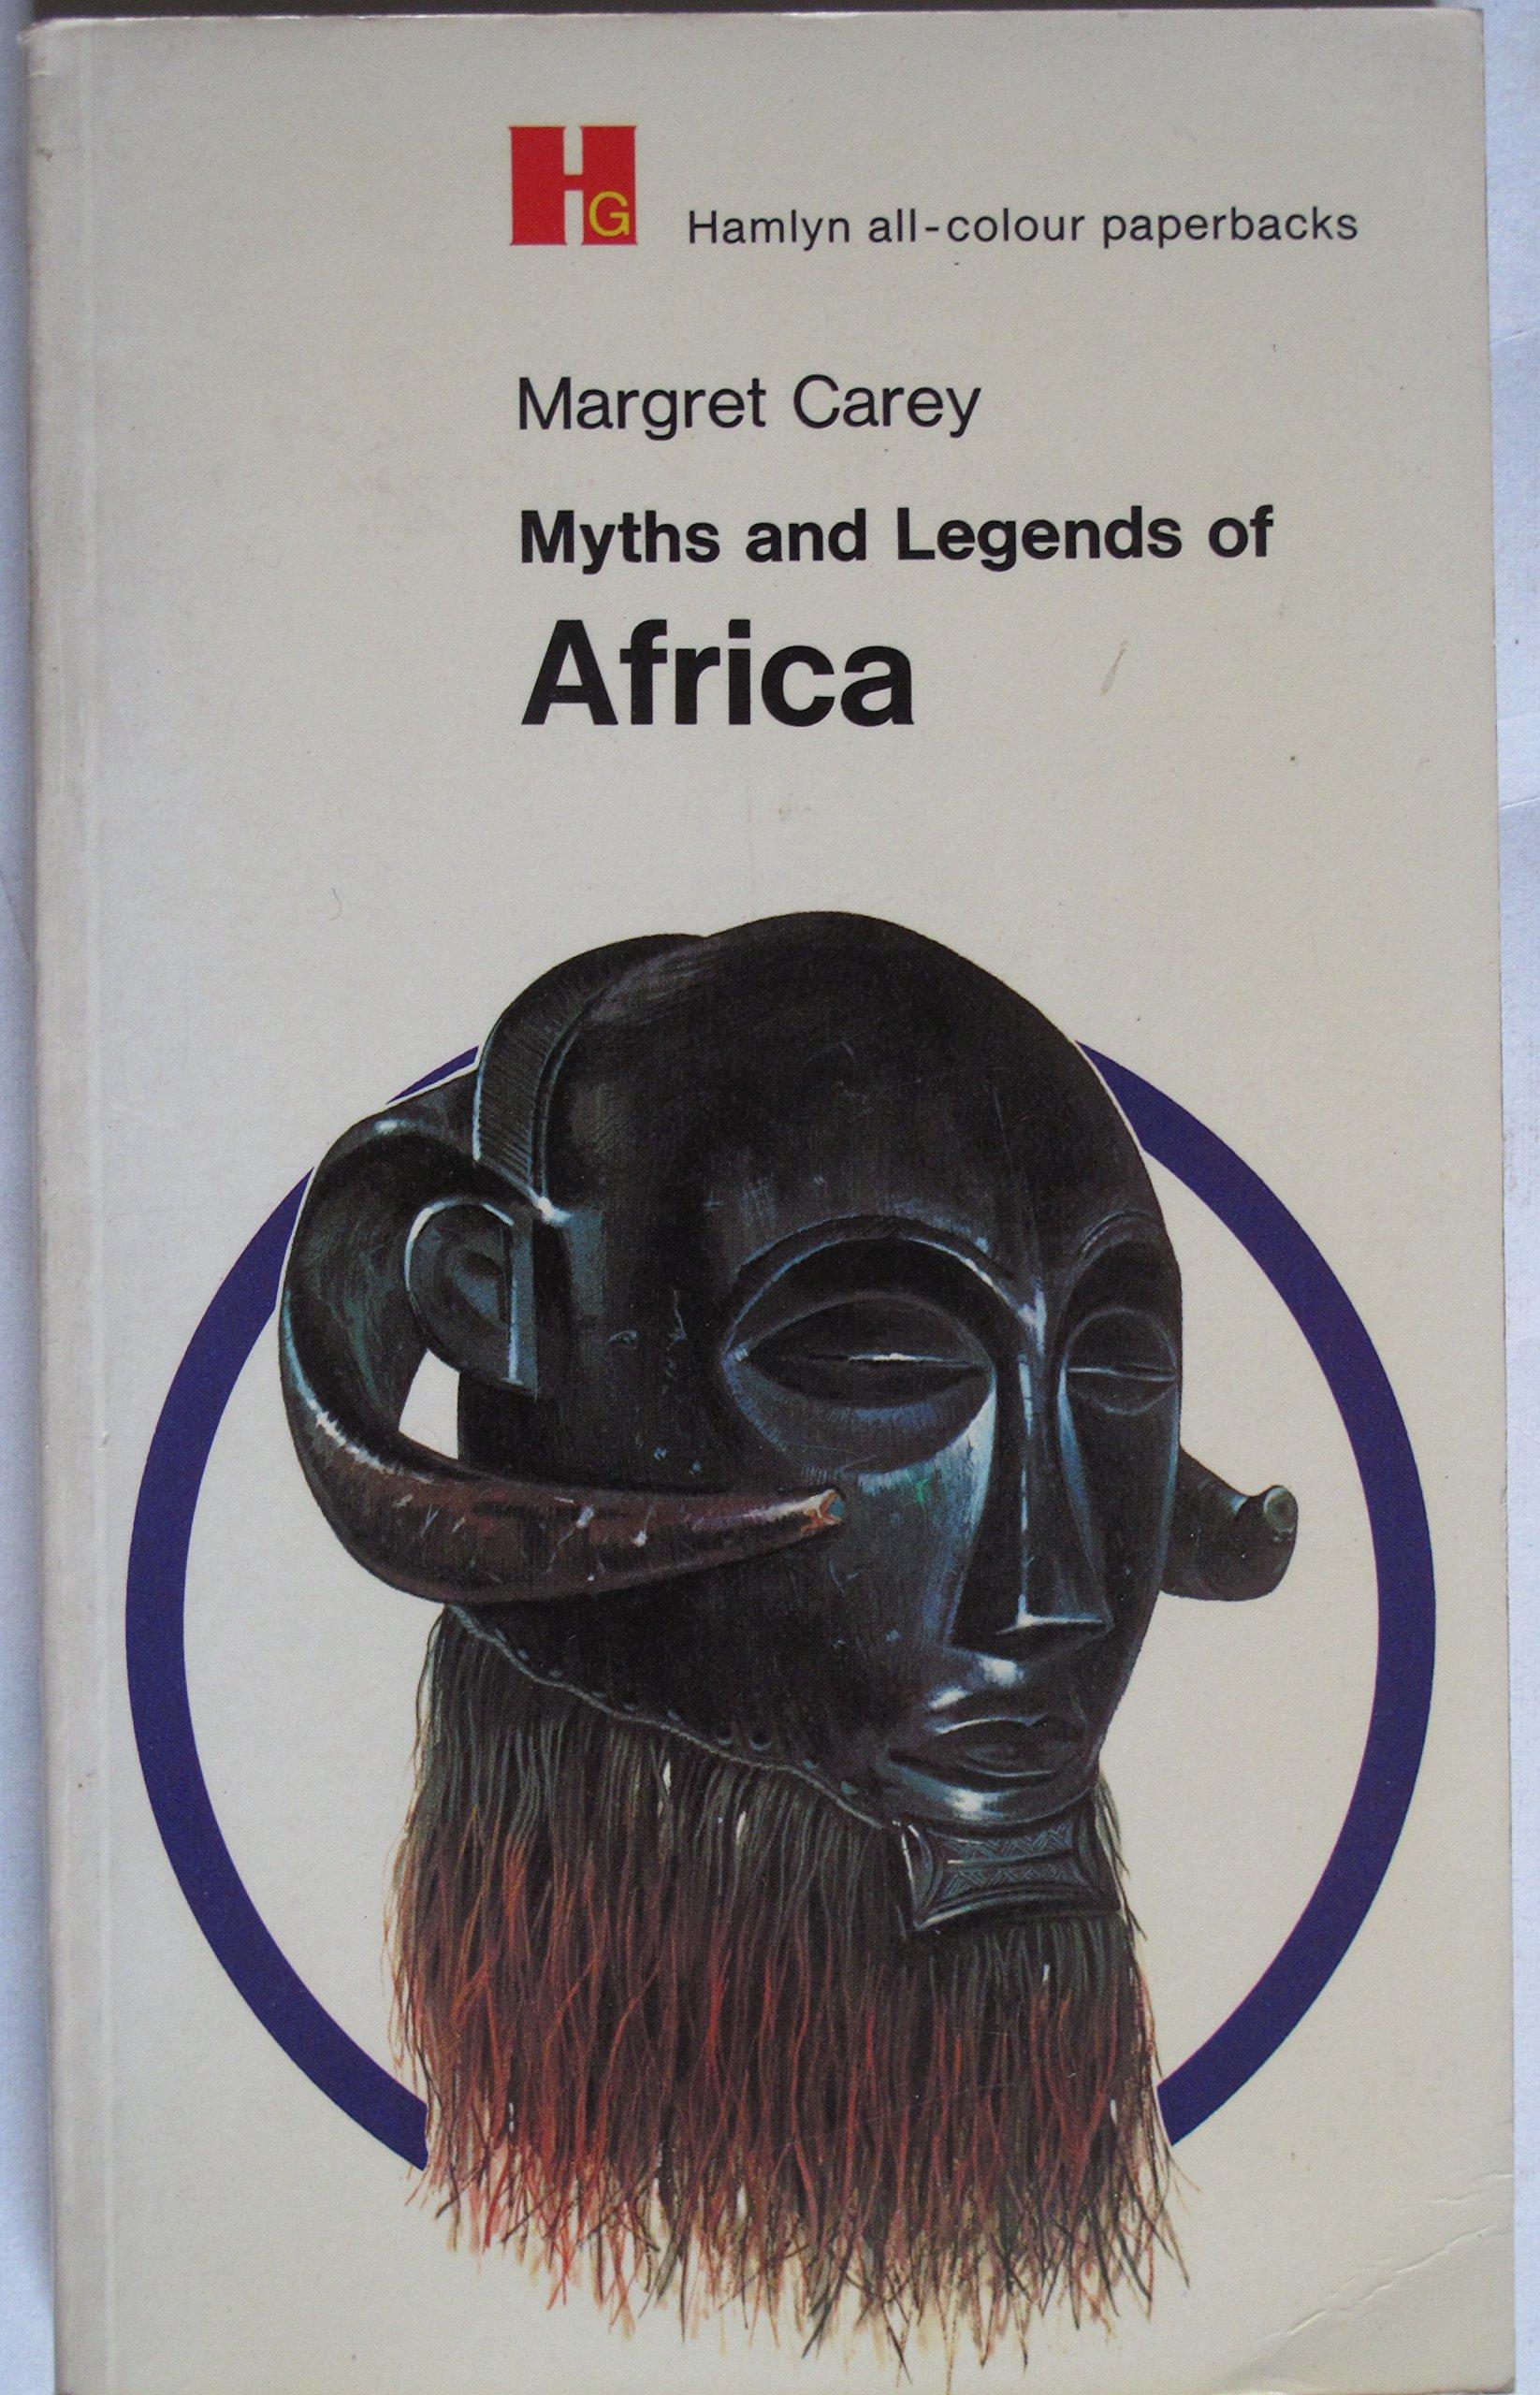 Myths and Legends of Africa: Amazon.es: Carey, Margret ...